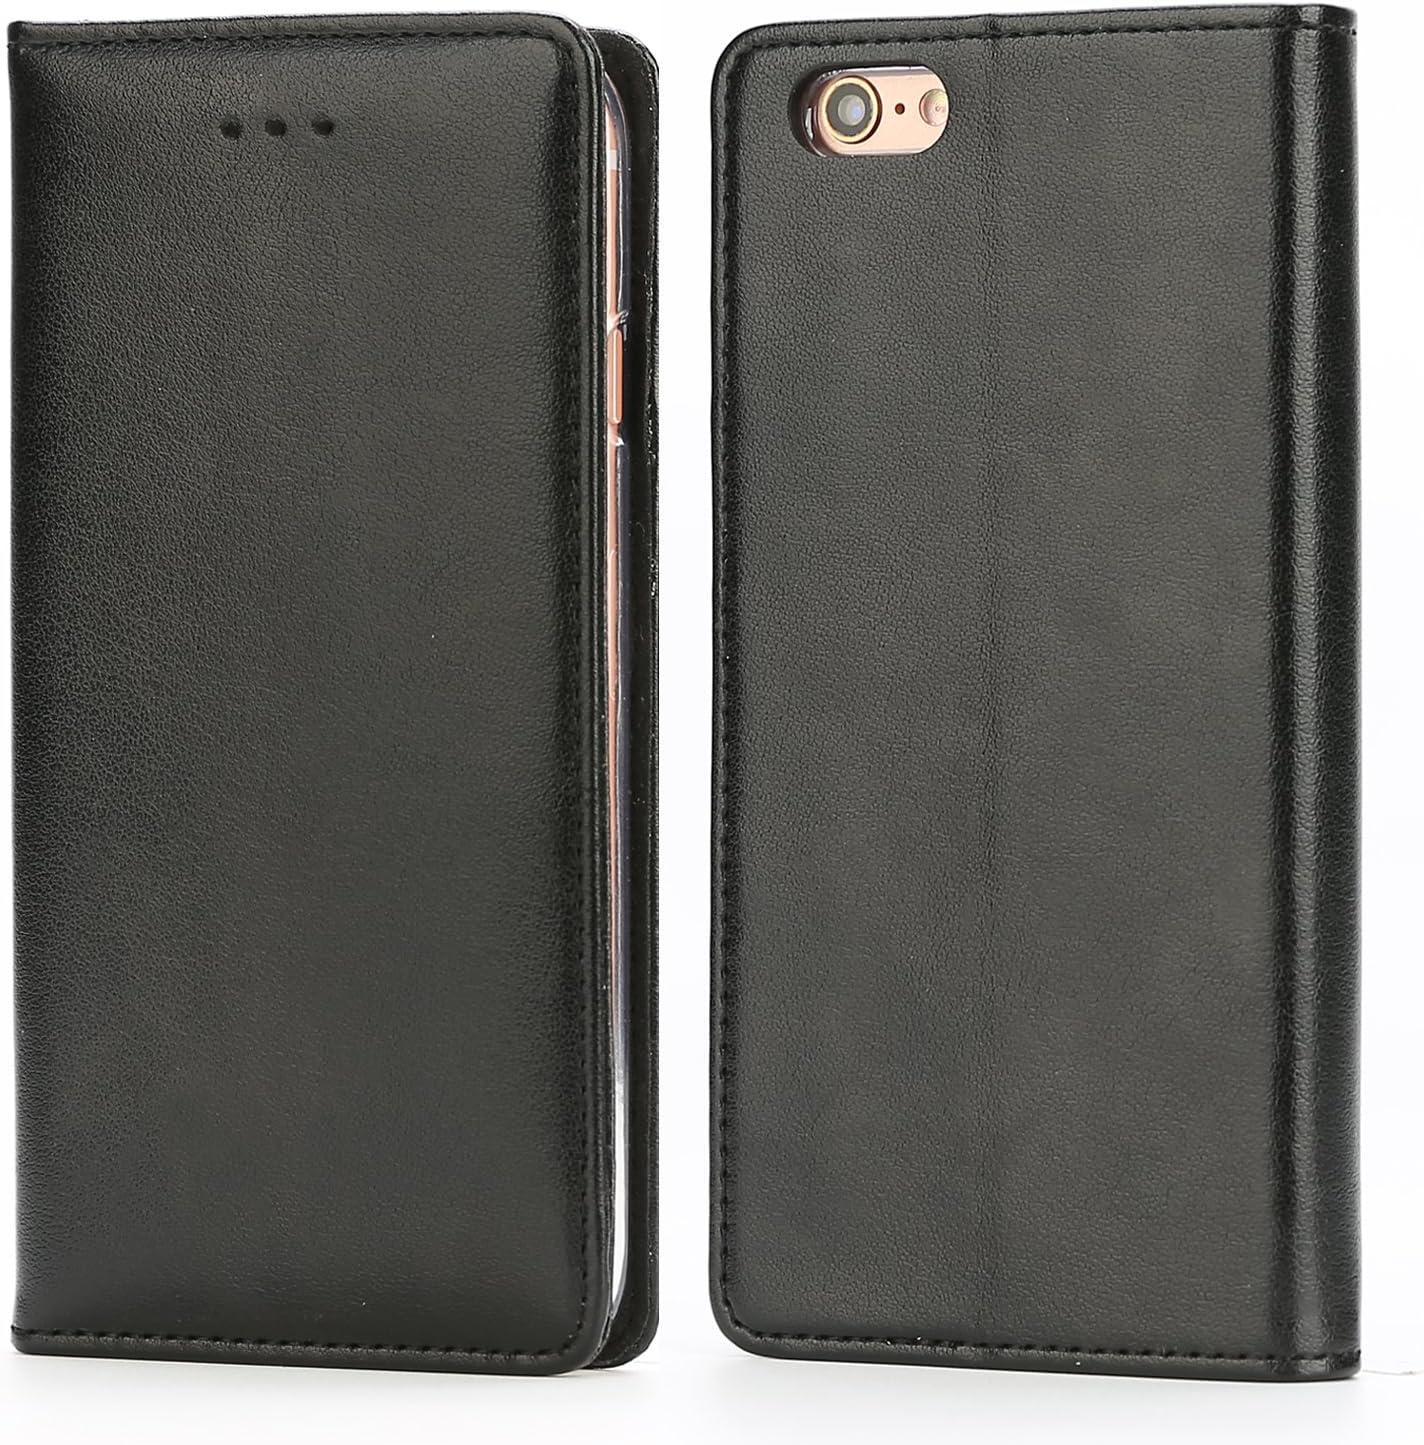 Funda iPhone 6 / 6S, IPHOX Cuero Fundas iPhone [Ranuras para Tarjetas][Cierre Magnético] [Soporte Plegable] [Ultra-Delgado]TPU Parachoques Cover Para Apple iPhone 6S / 6(Black)